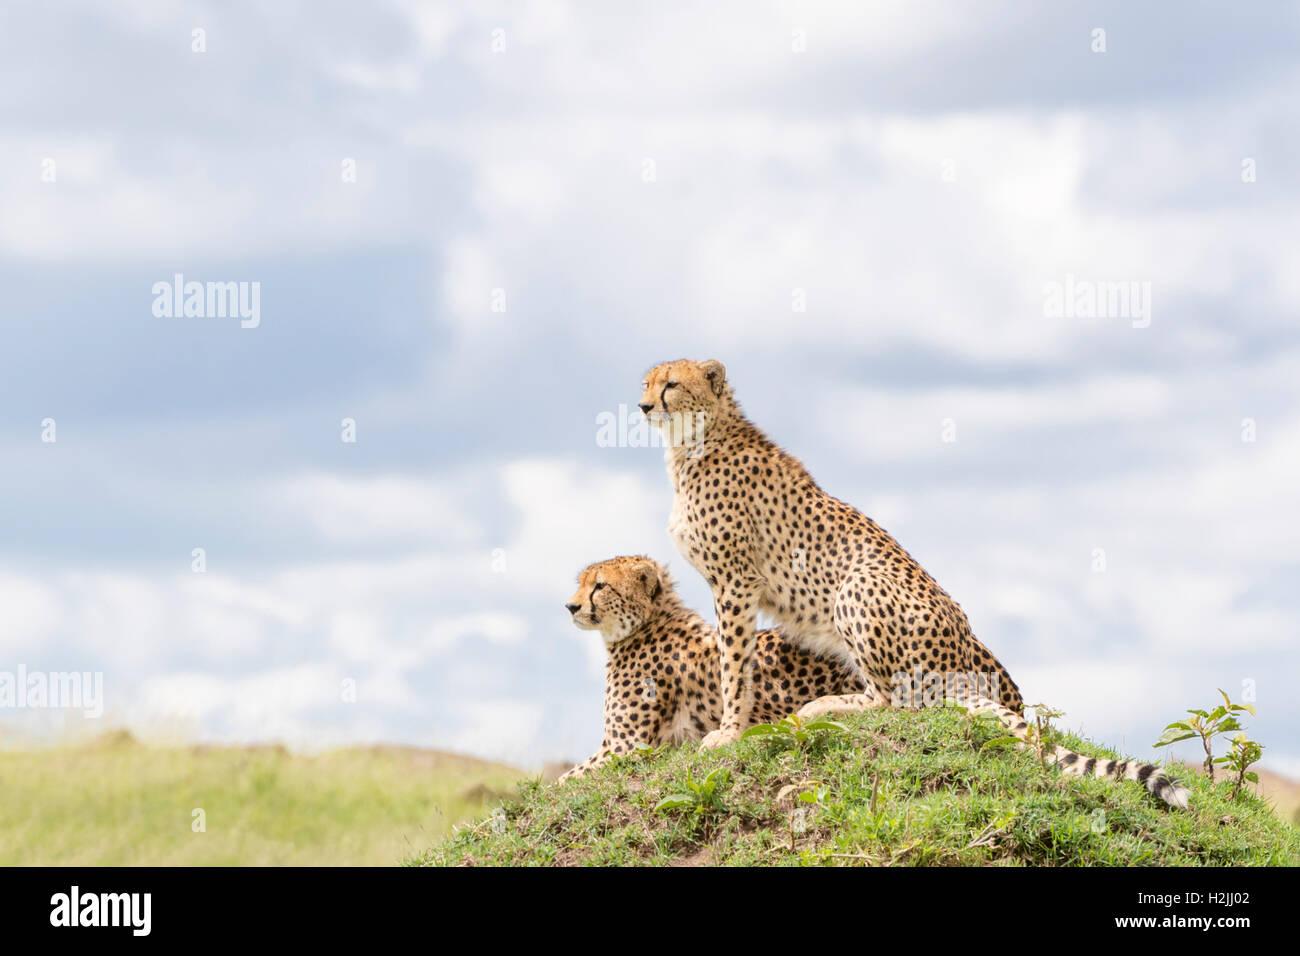 Cheetah (Acinonix jubatus) sitting on hill looking over savanna, Maasai Mara National Reserve, Kenya - Stock Image